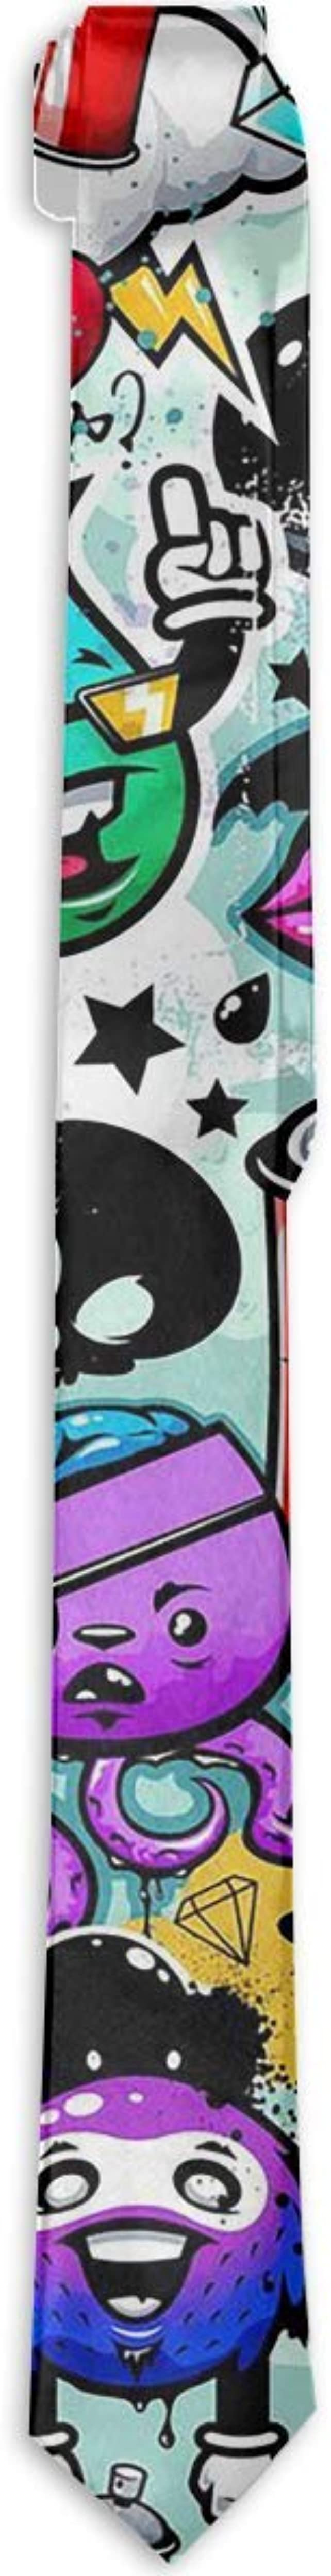 Accesorios para disfraz de dibujos animados Trippy Graffiti Art ...